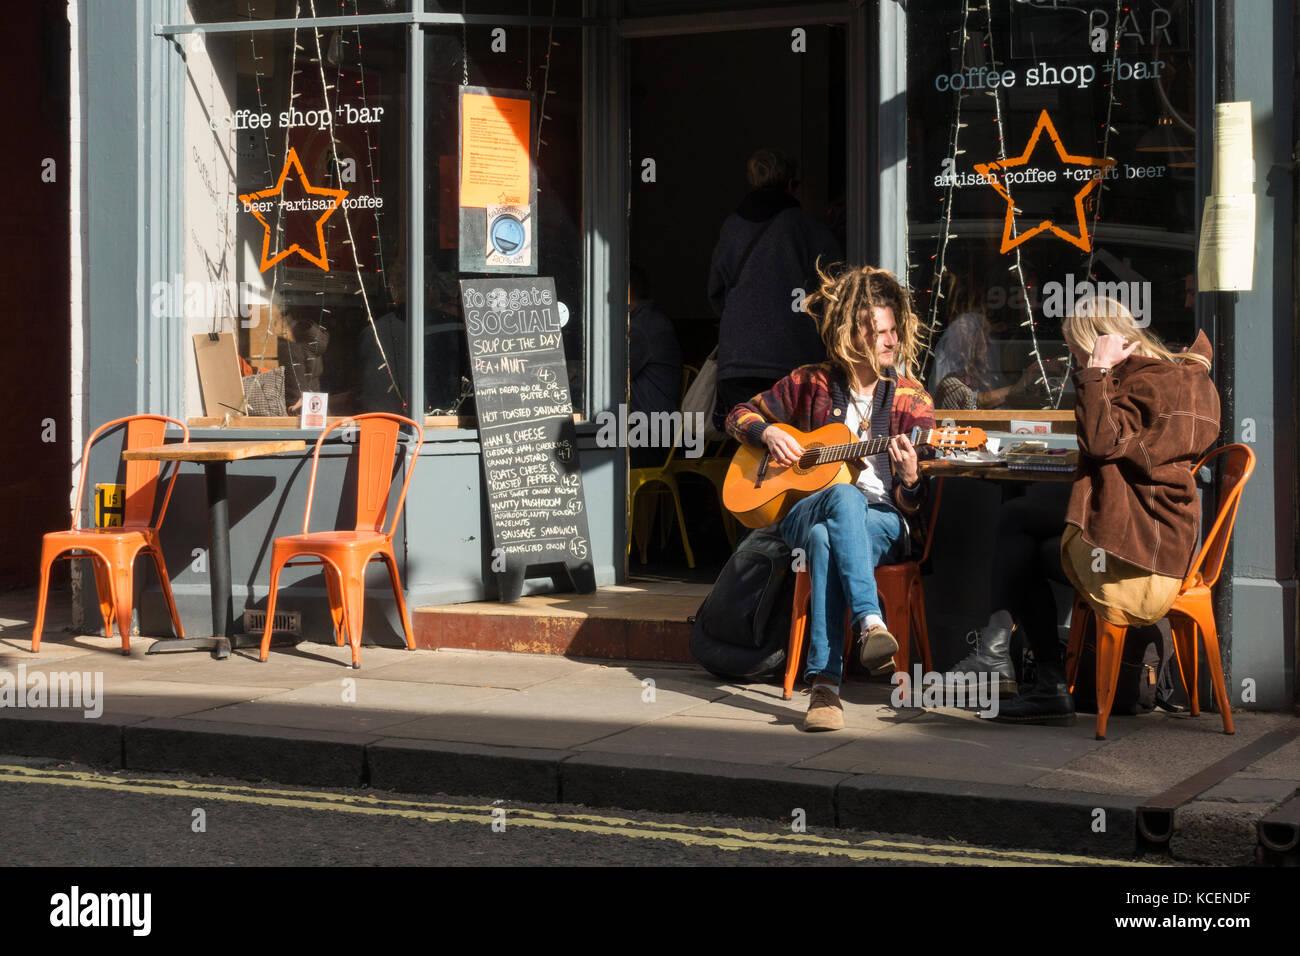 Pareja joven sentarse en sun en una mesa fuera del Social Fossgate Café & Bar, York, Inglaterra, Reino Imagen De Stock